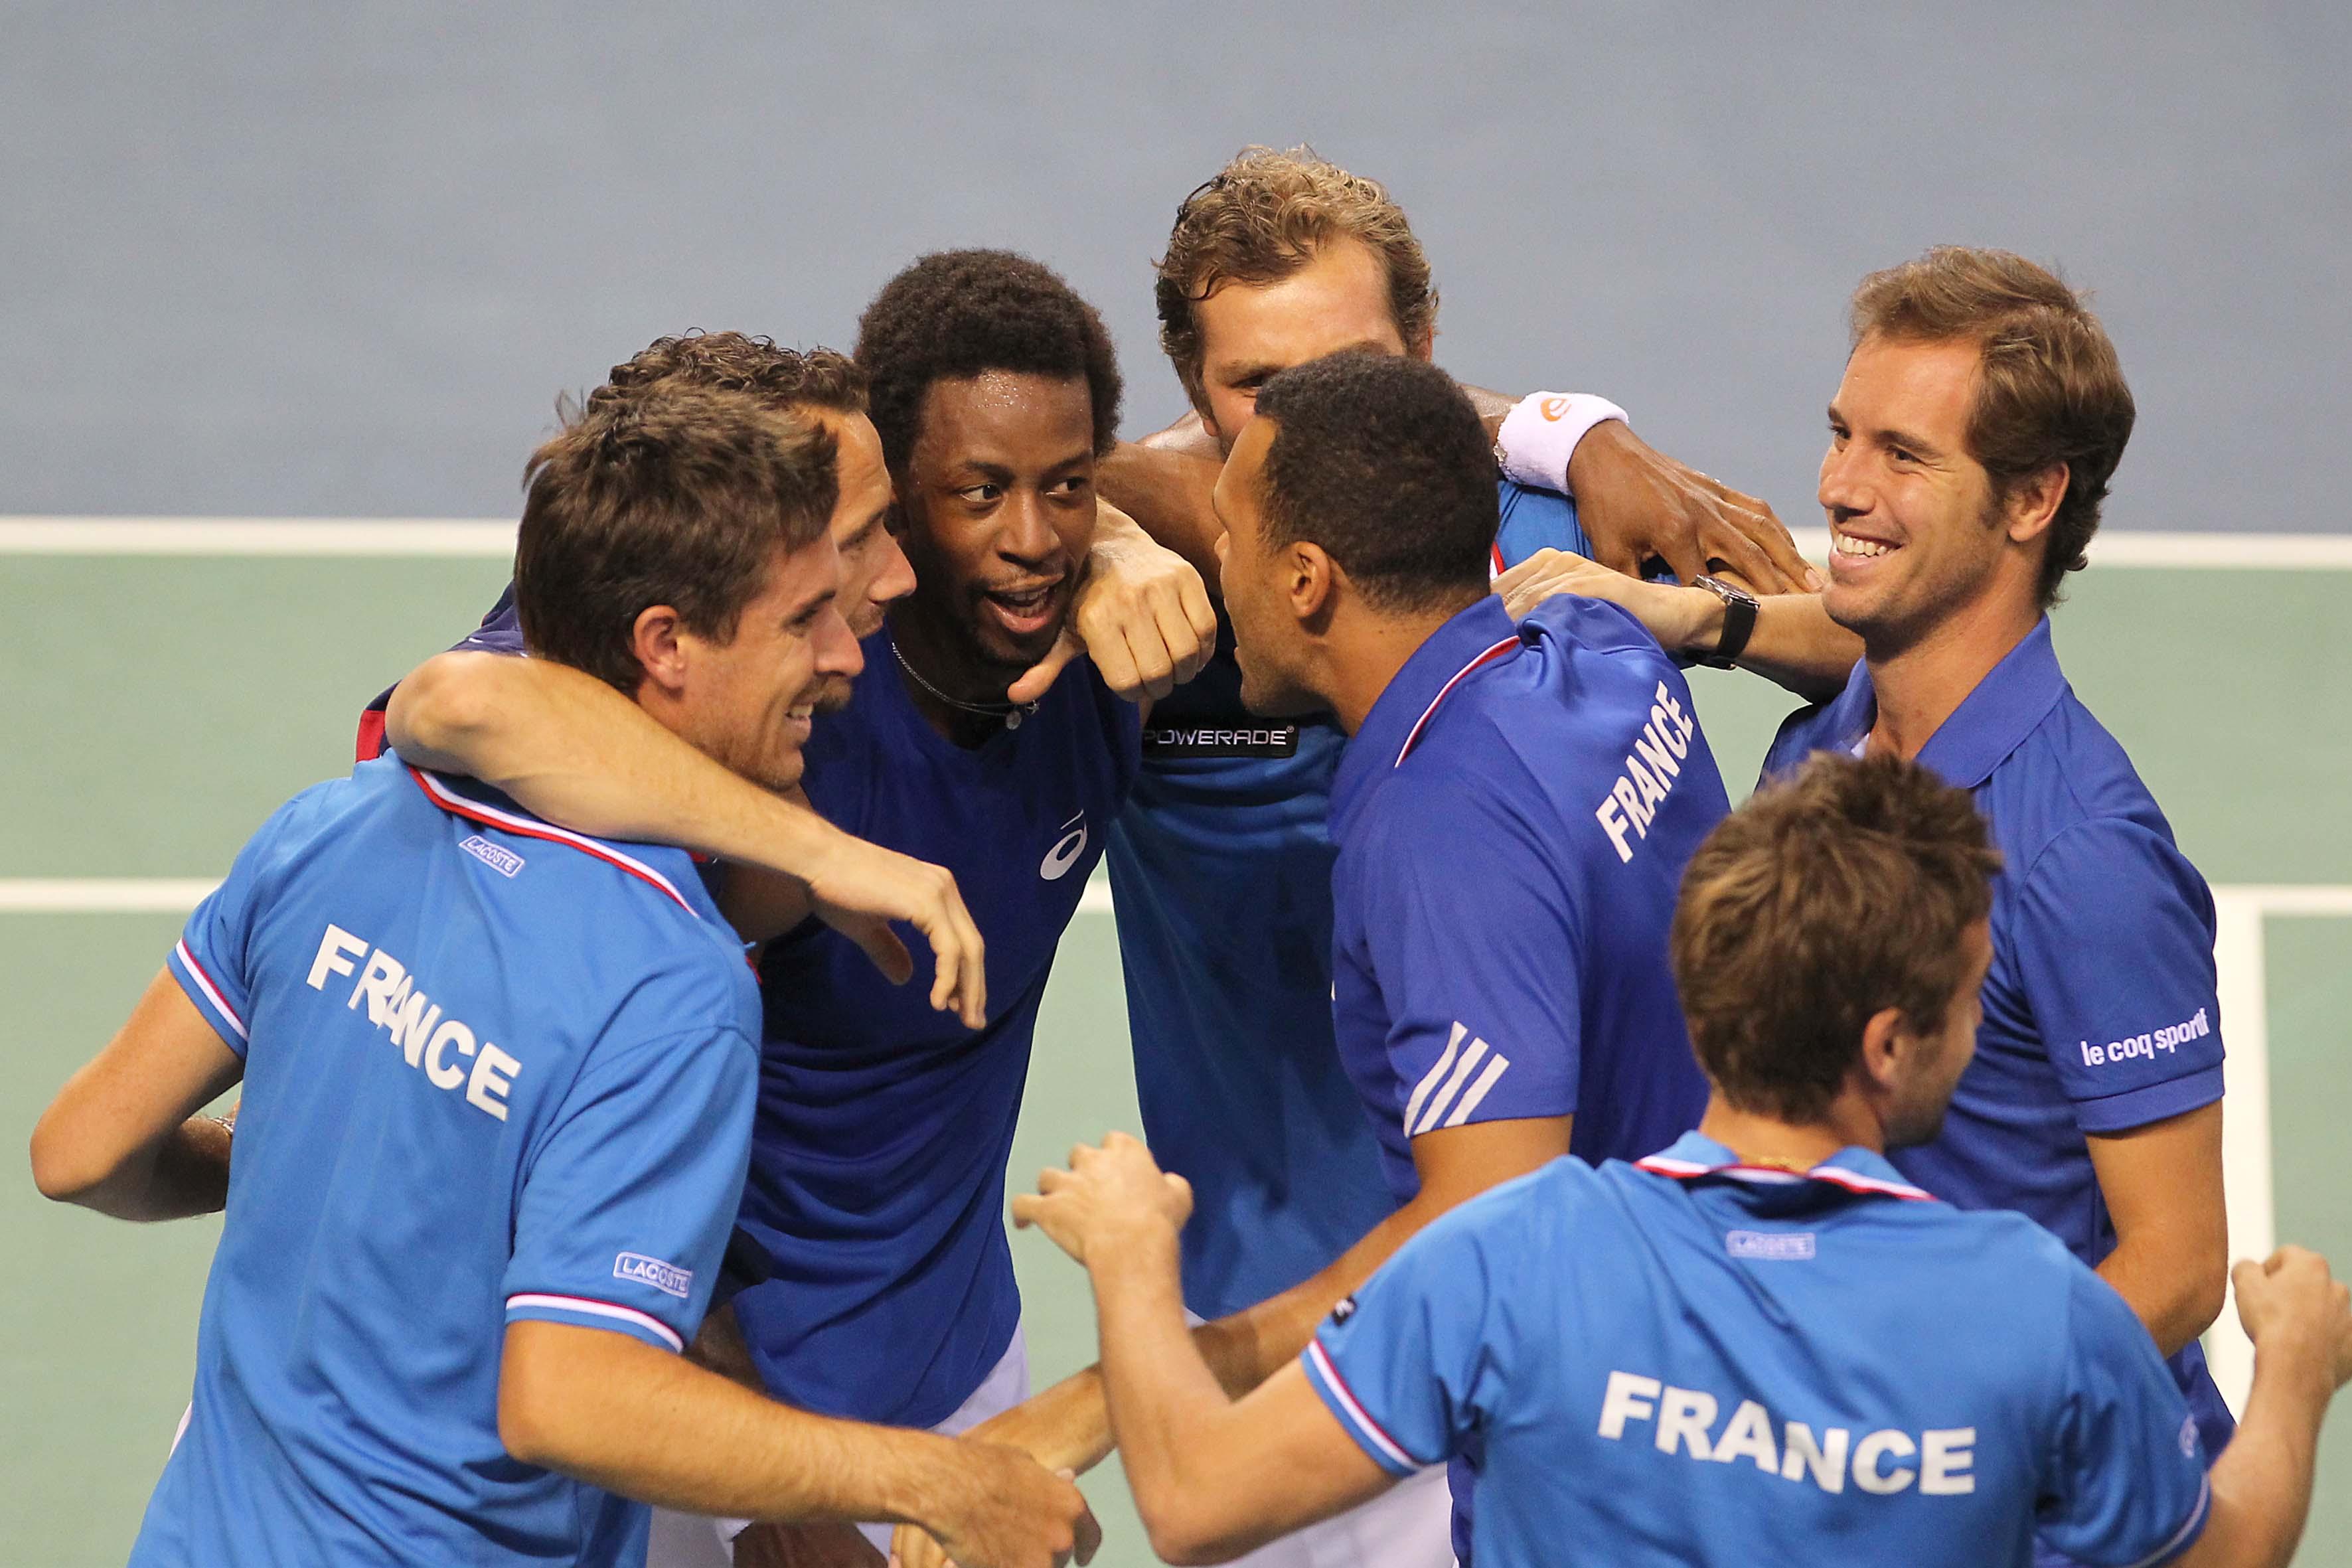 2014_marvaux_tennis_davis cup_02.jpg